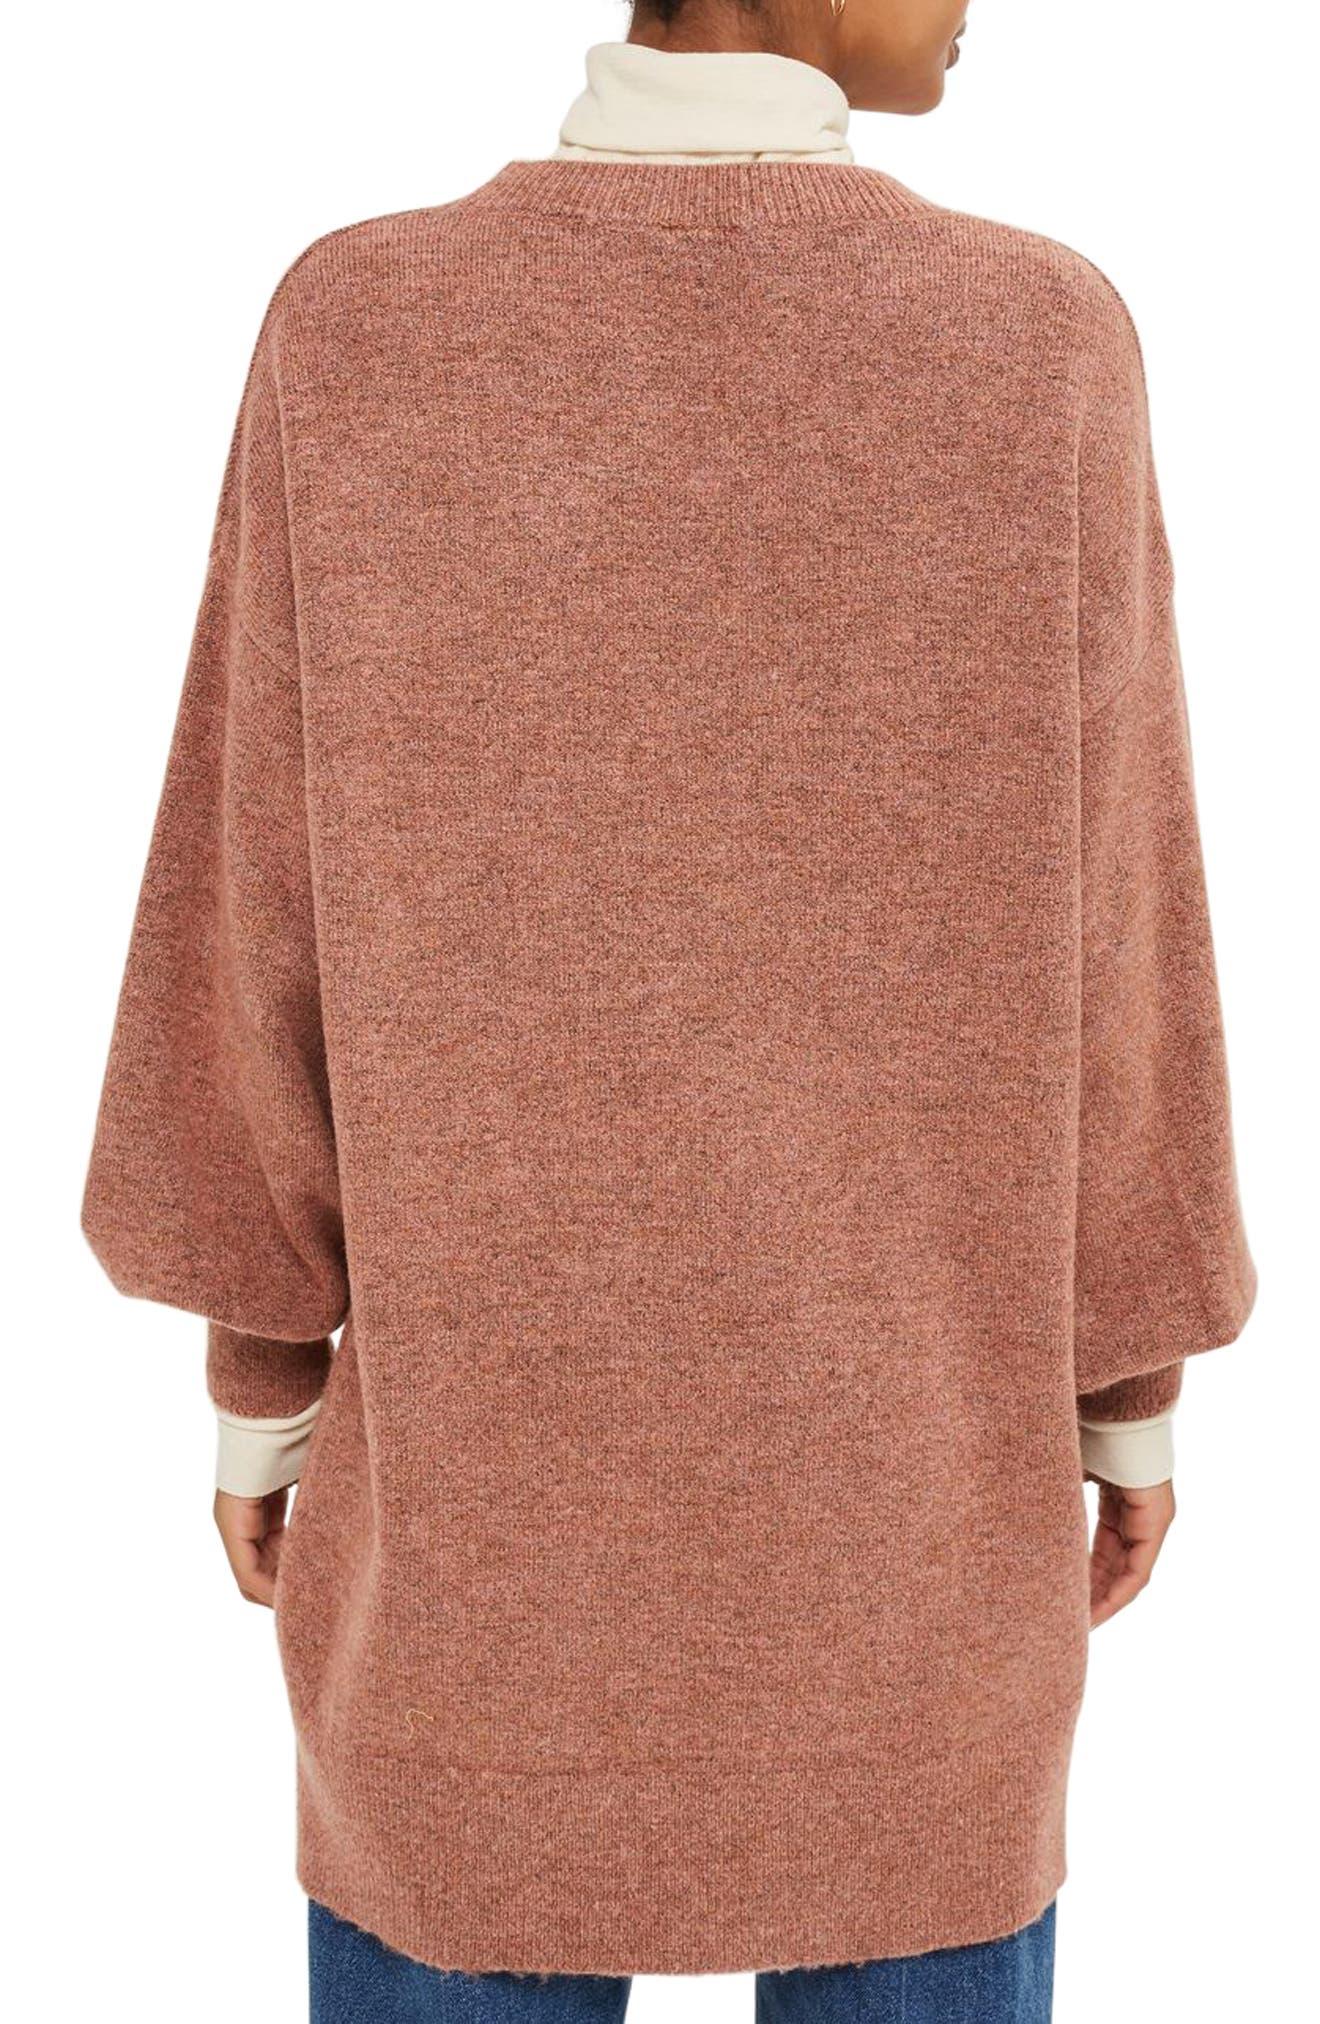 Sweater Dress,                             Alternate thumbnail 4, color,